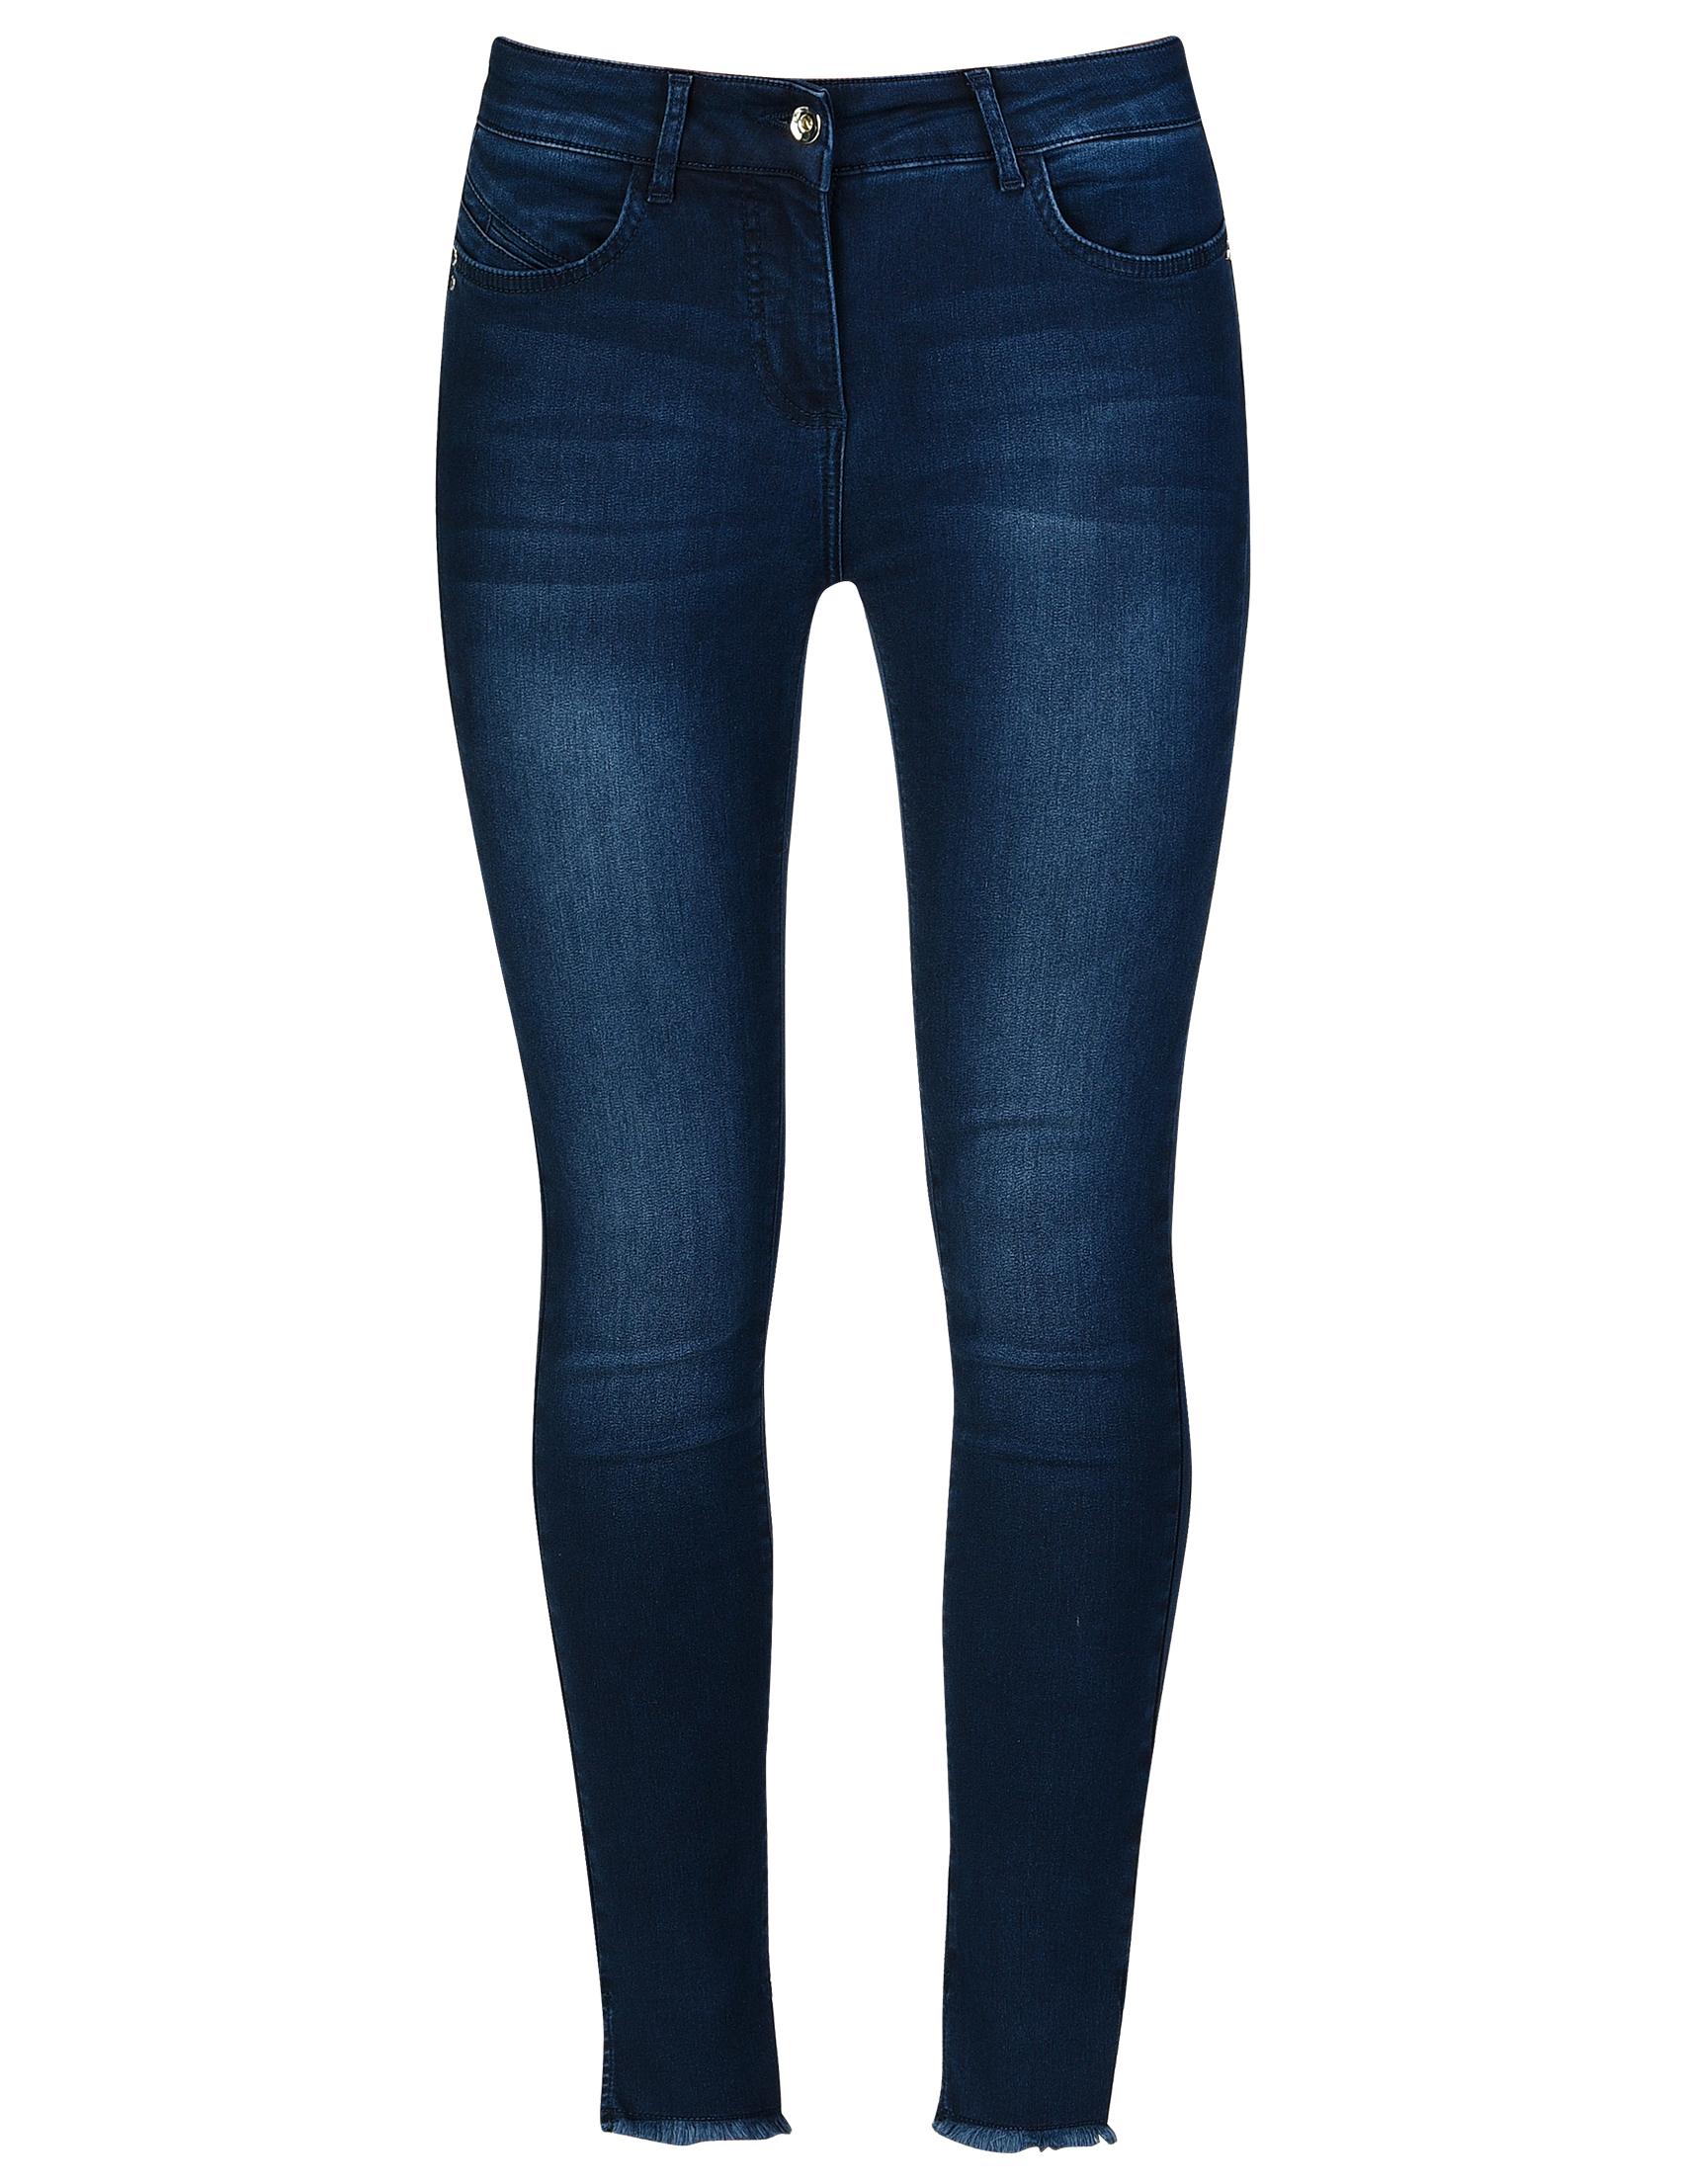 Женские джинсы PATRIZIA PEPE 8J0509-A1HIA-K723_blue